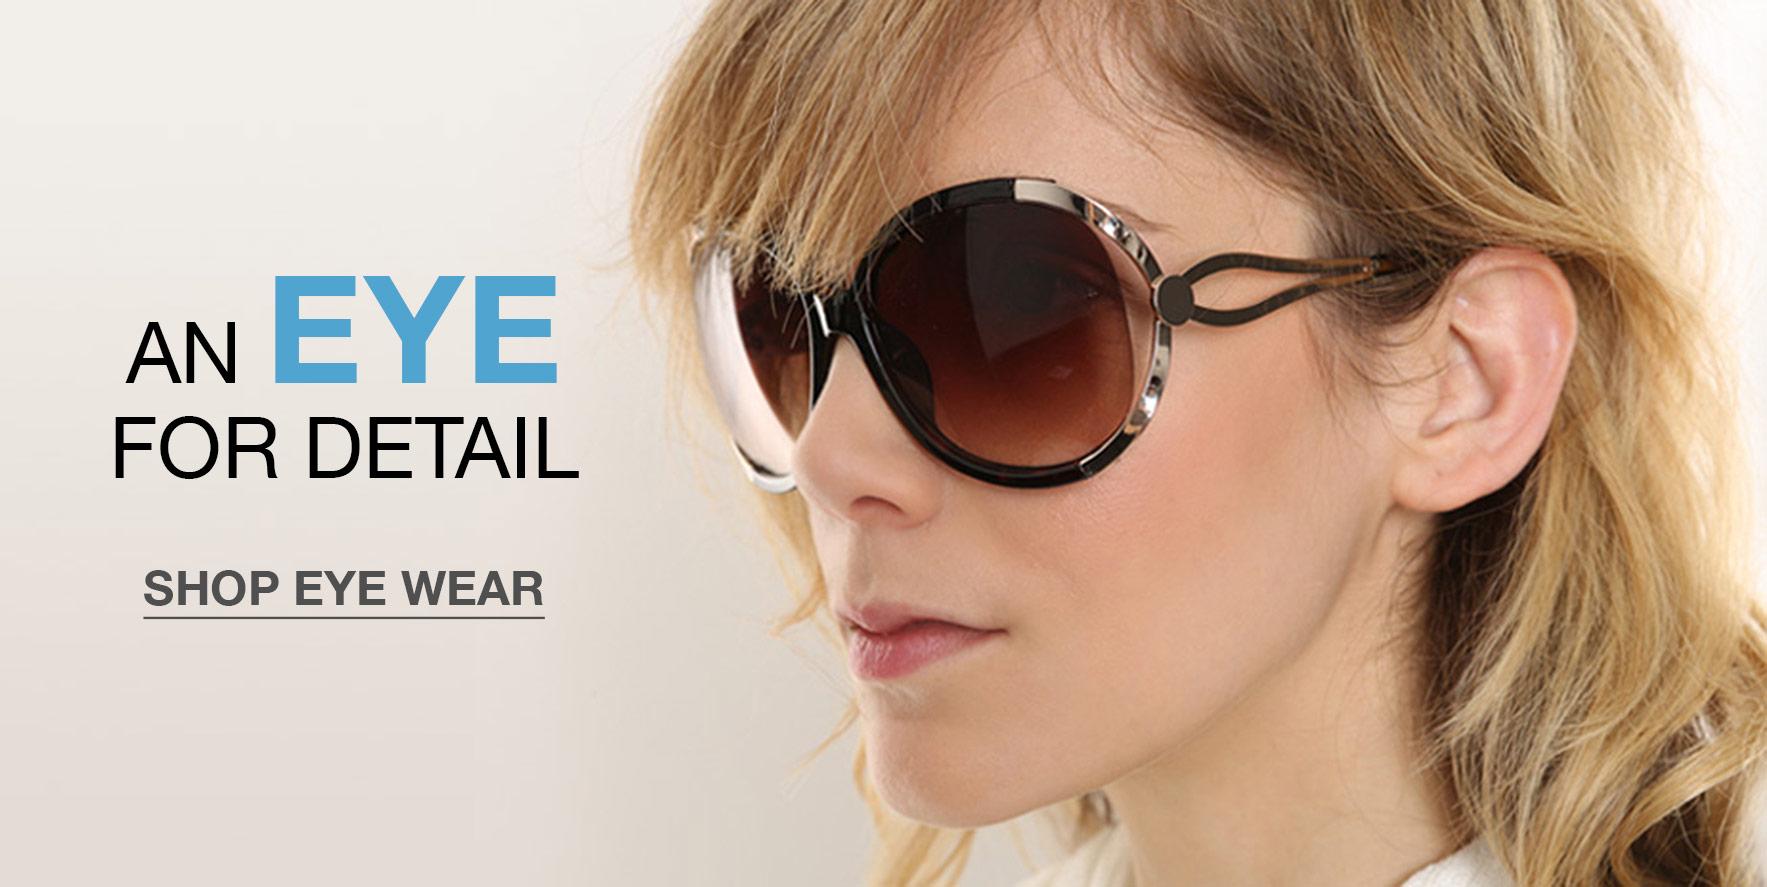 An eye for detail - Click to Shop Eye Wear